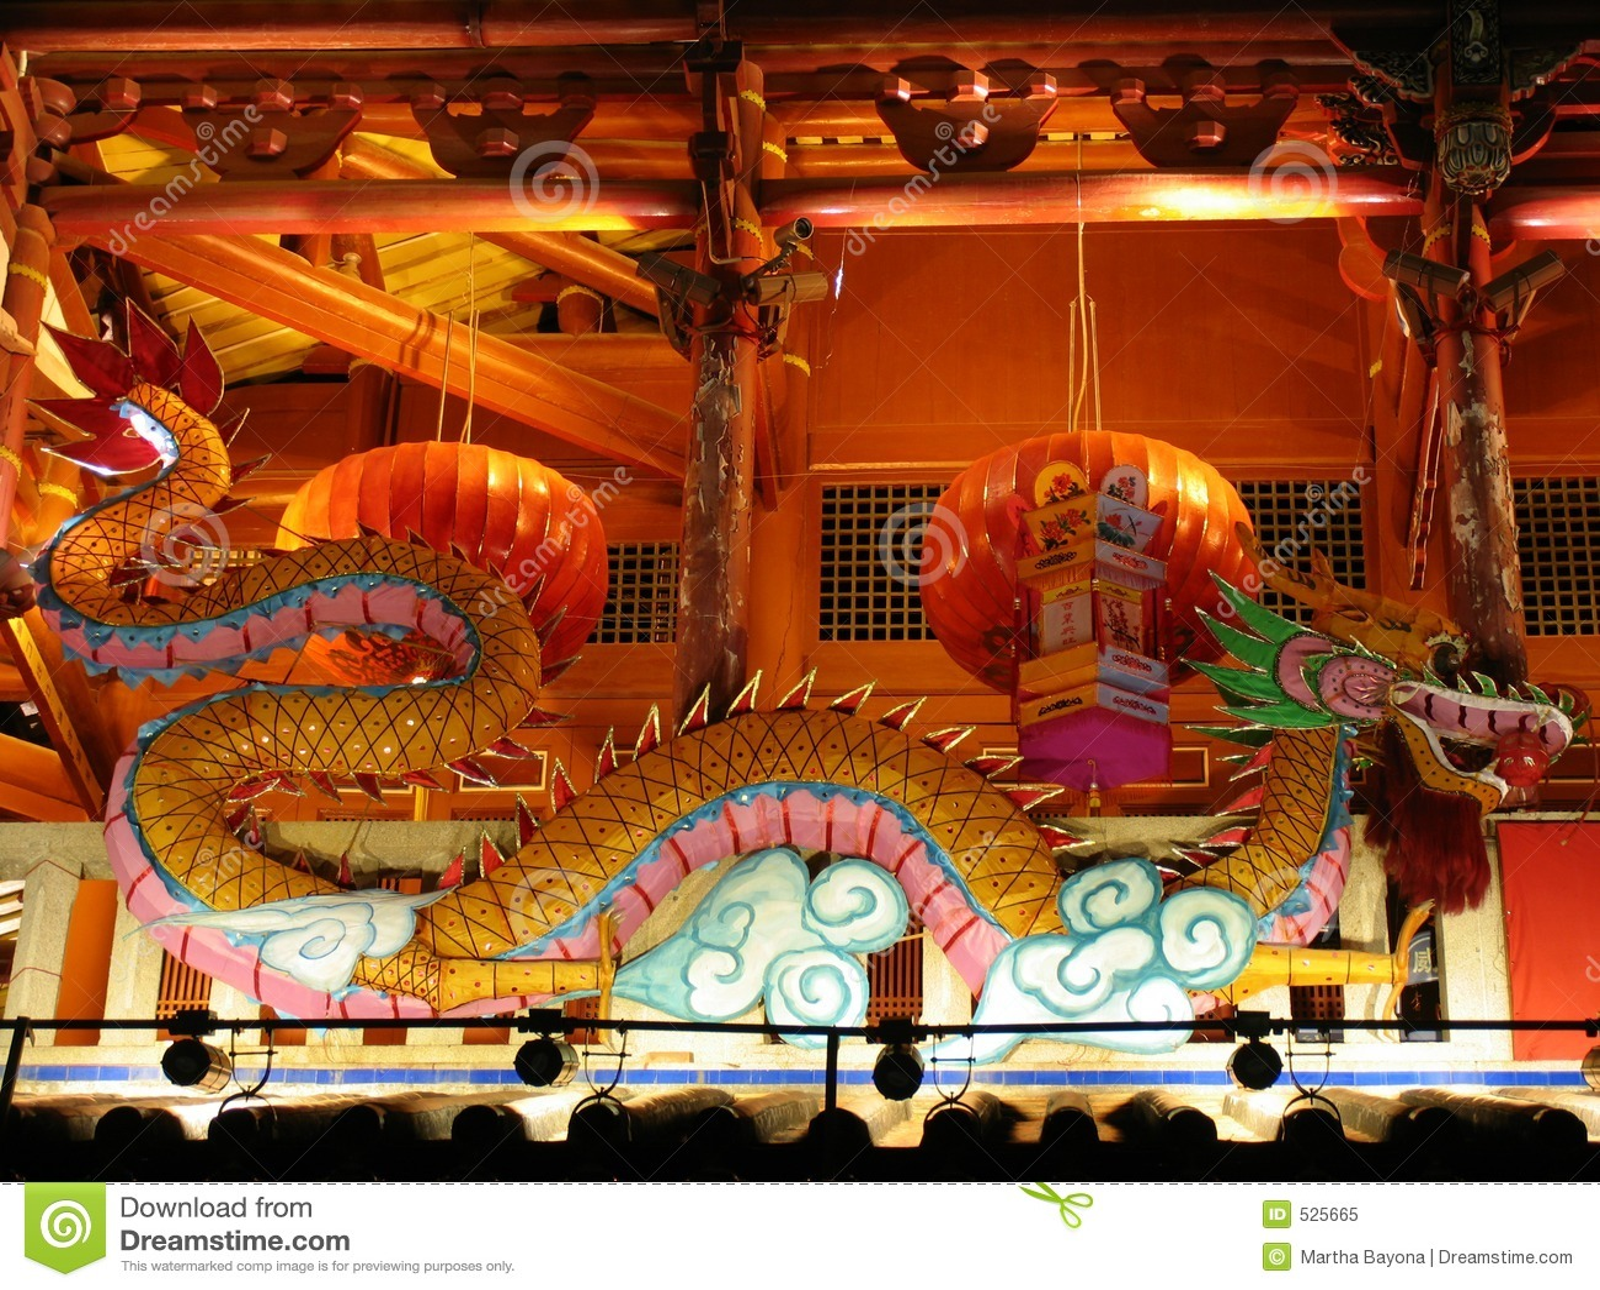 Download 中国装饰 库存图片. 图片 包括有 聚会所, 东方, 东部, 狂欢节, 灯笼, 公平, 重新创建, 汉语, 装饰 - 525665